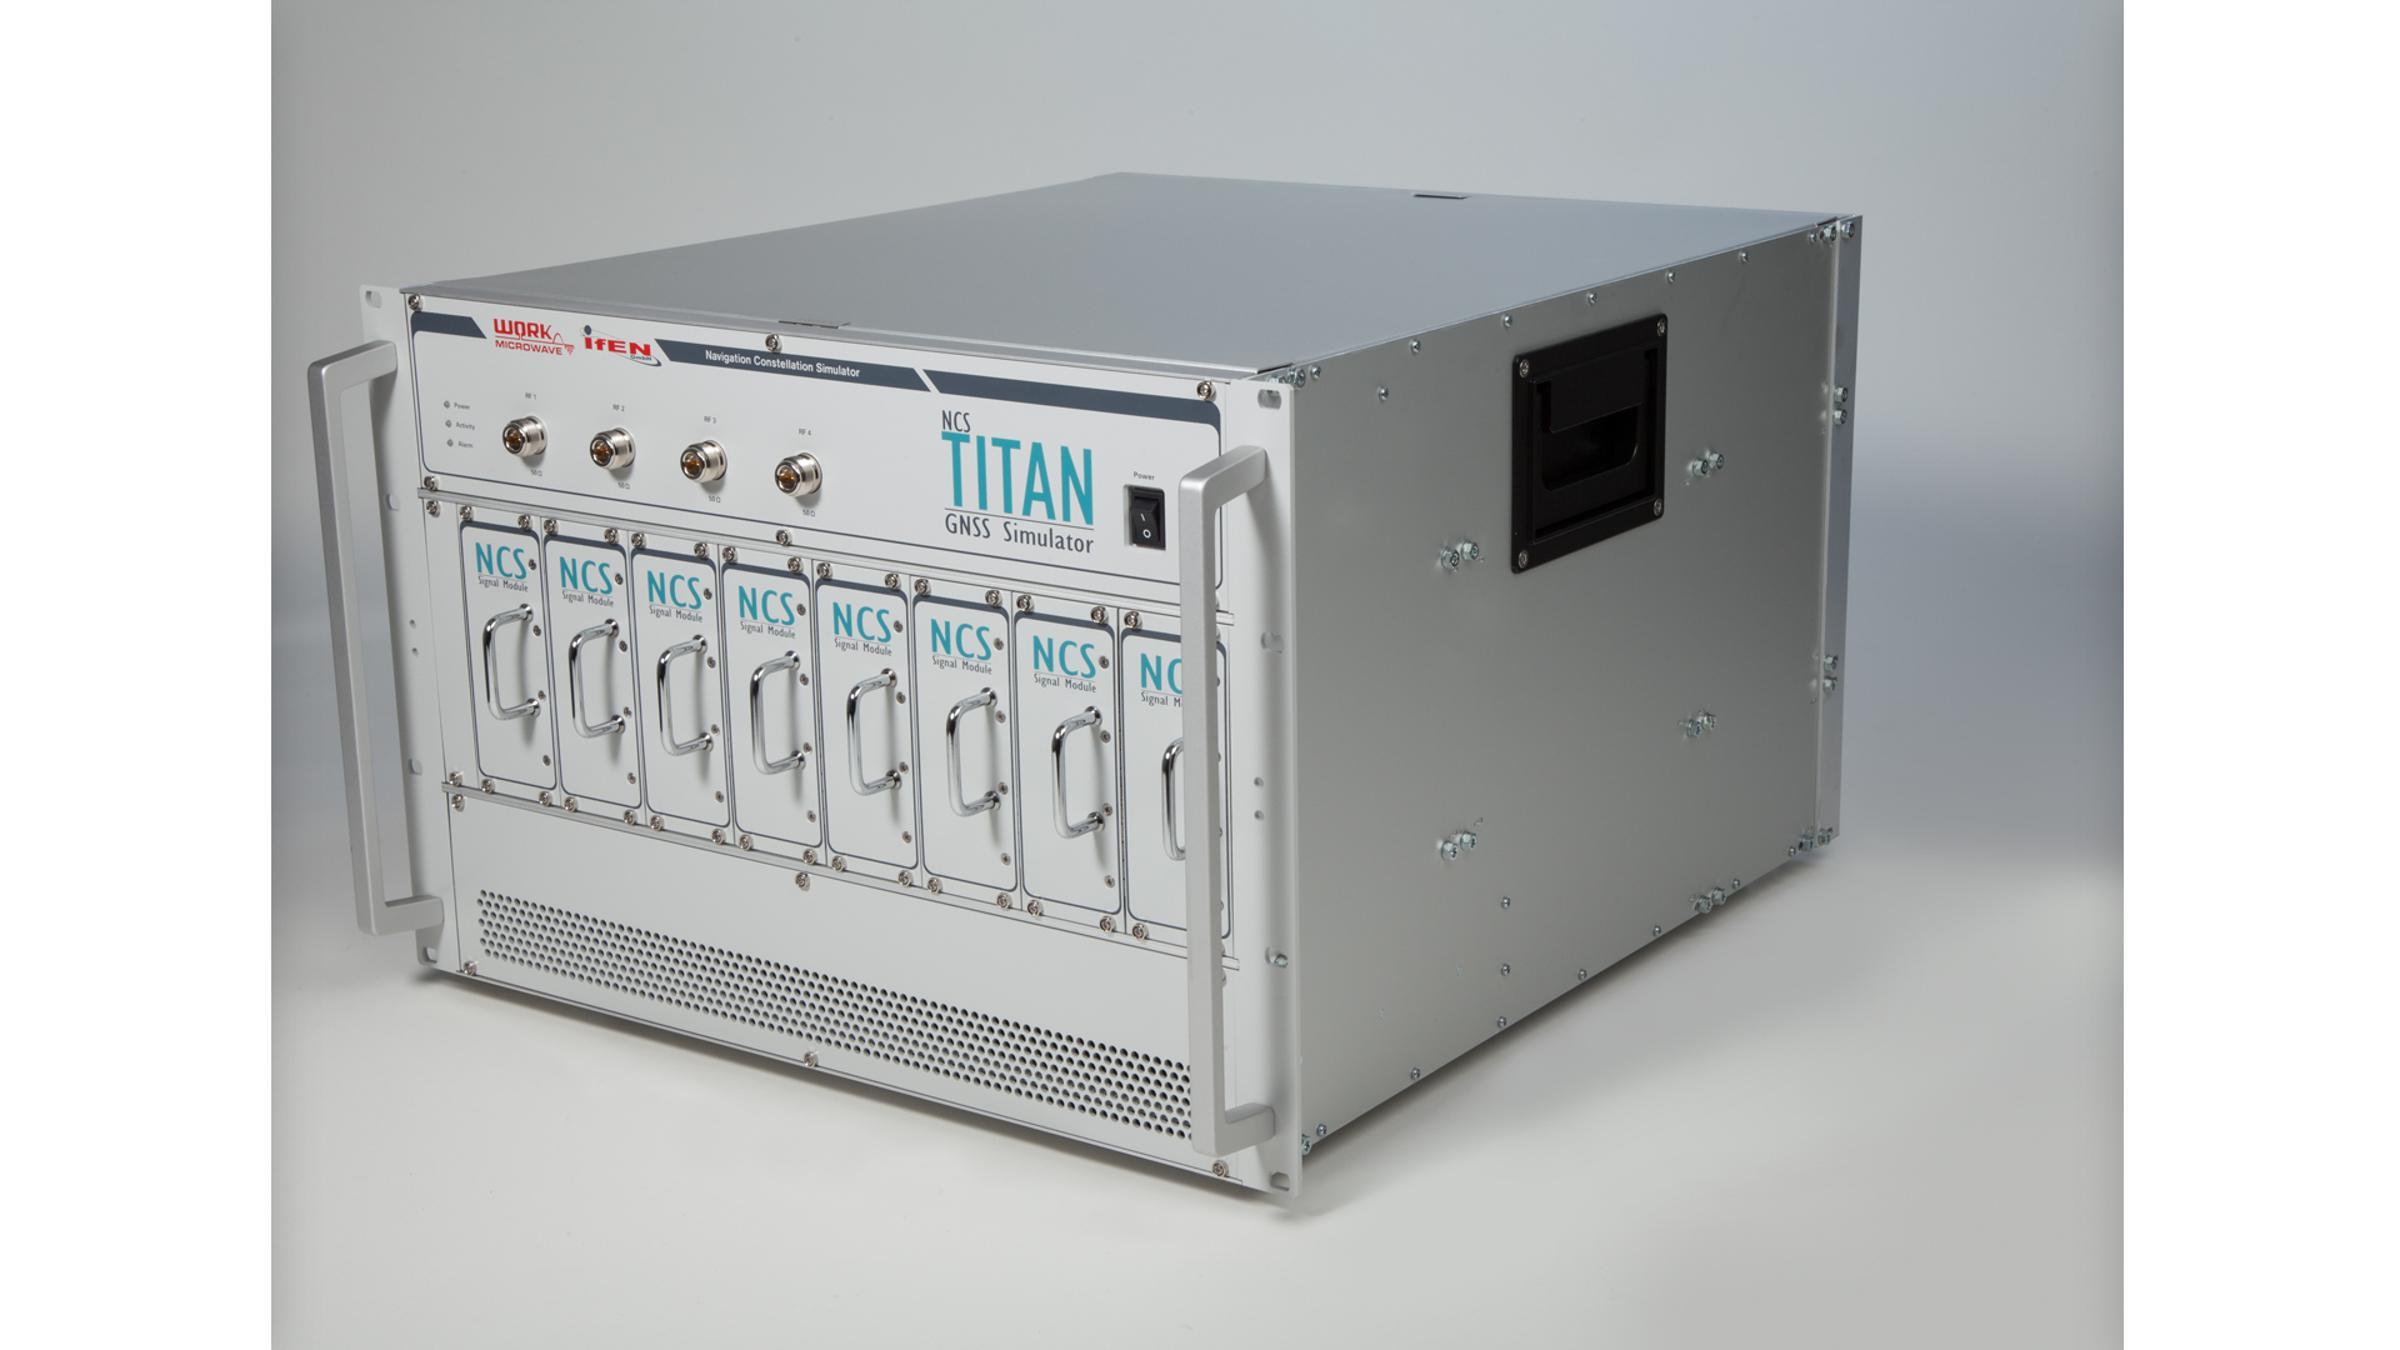 NCS Titan GNSS Simulator